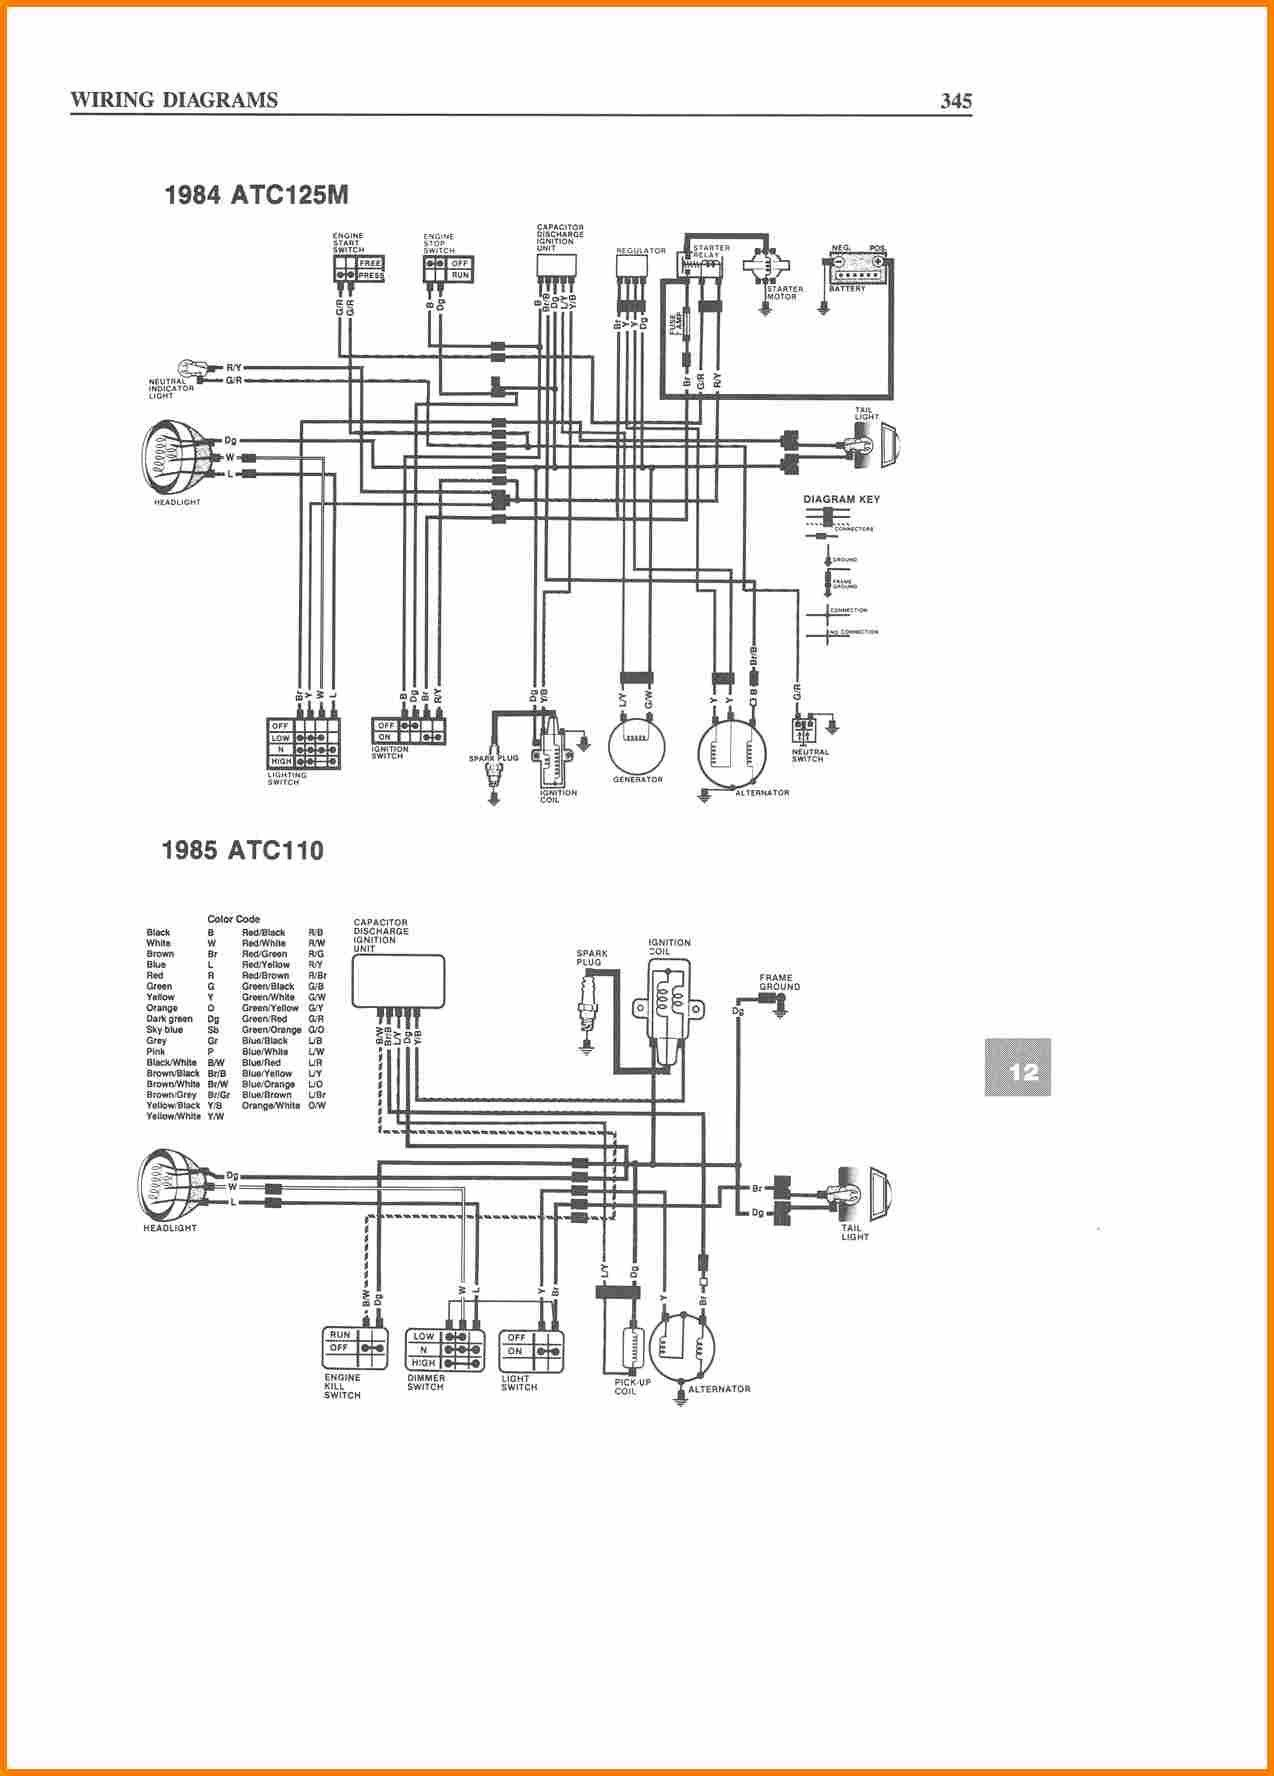 Kazuma Quad Wiring Diagram 2004 F150 Radio Redcat Geen Ortholinc De Rh 12 Malibustixx Atv Kmx 50